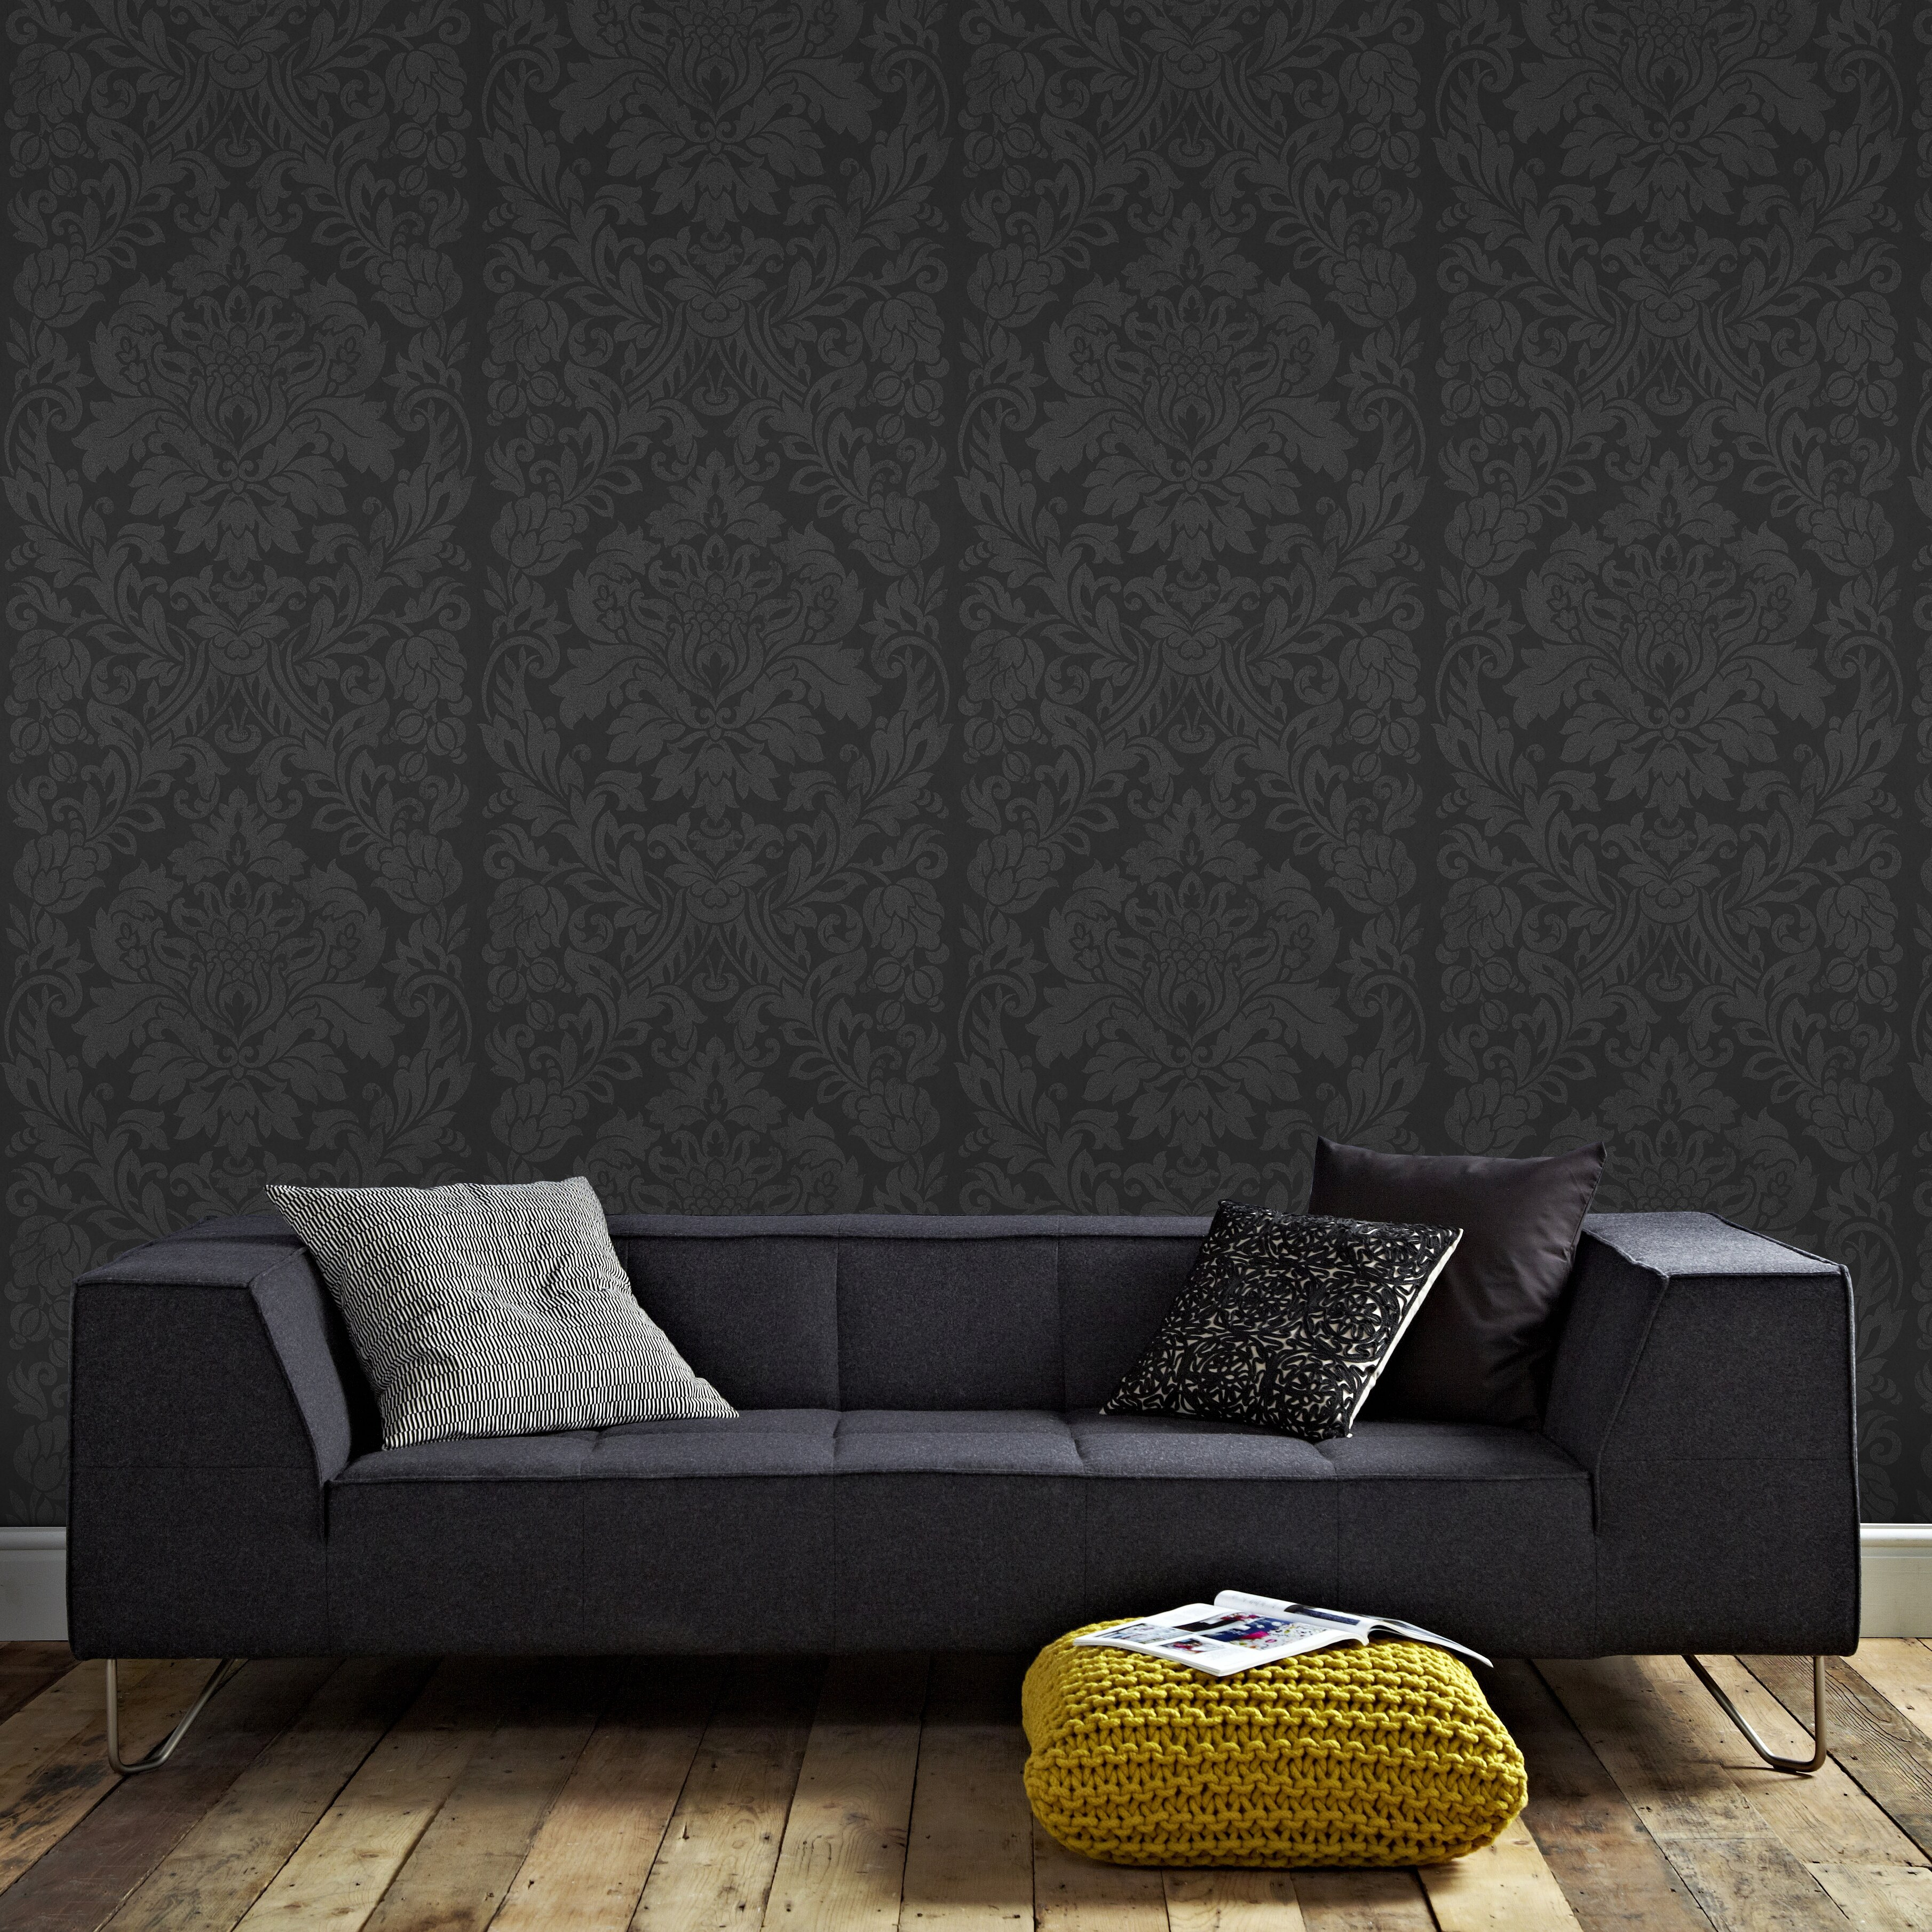 graham brown artisan gloriana 33 39 x 20 damask wallpaper. Black Bedroom Furniture Sets. Home Design Ideas